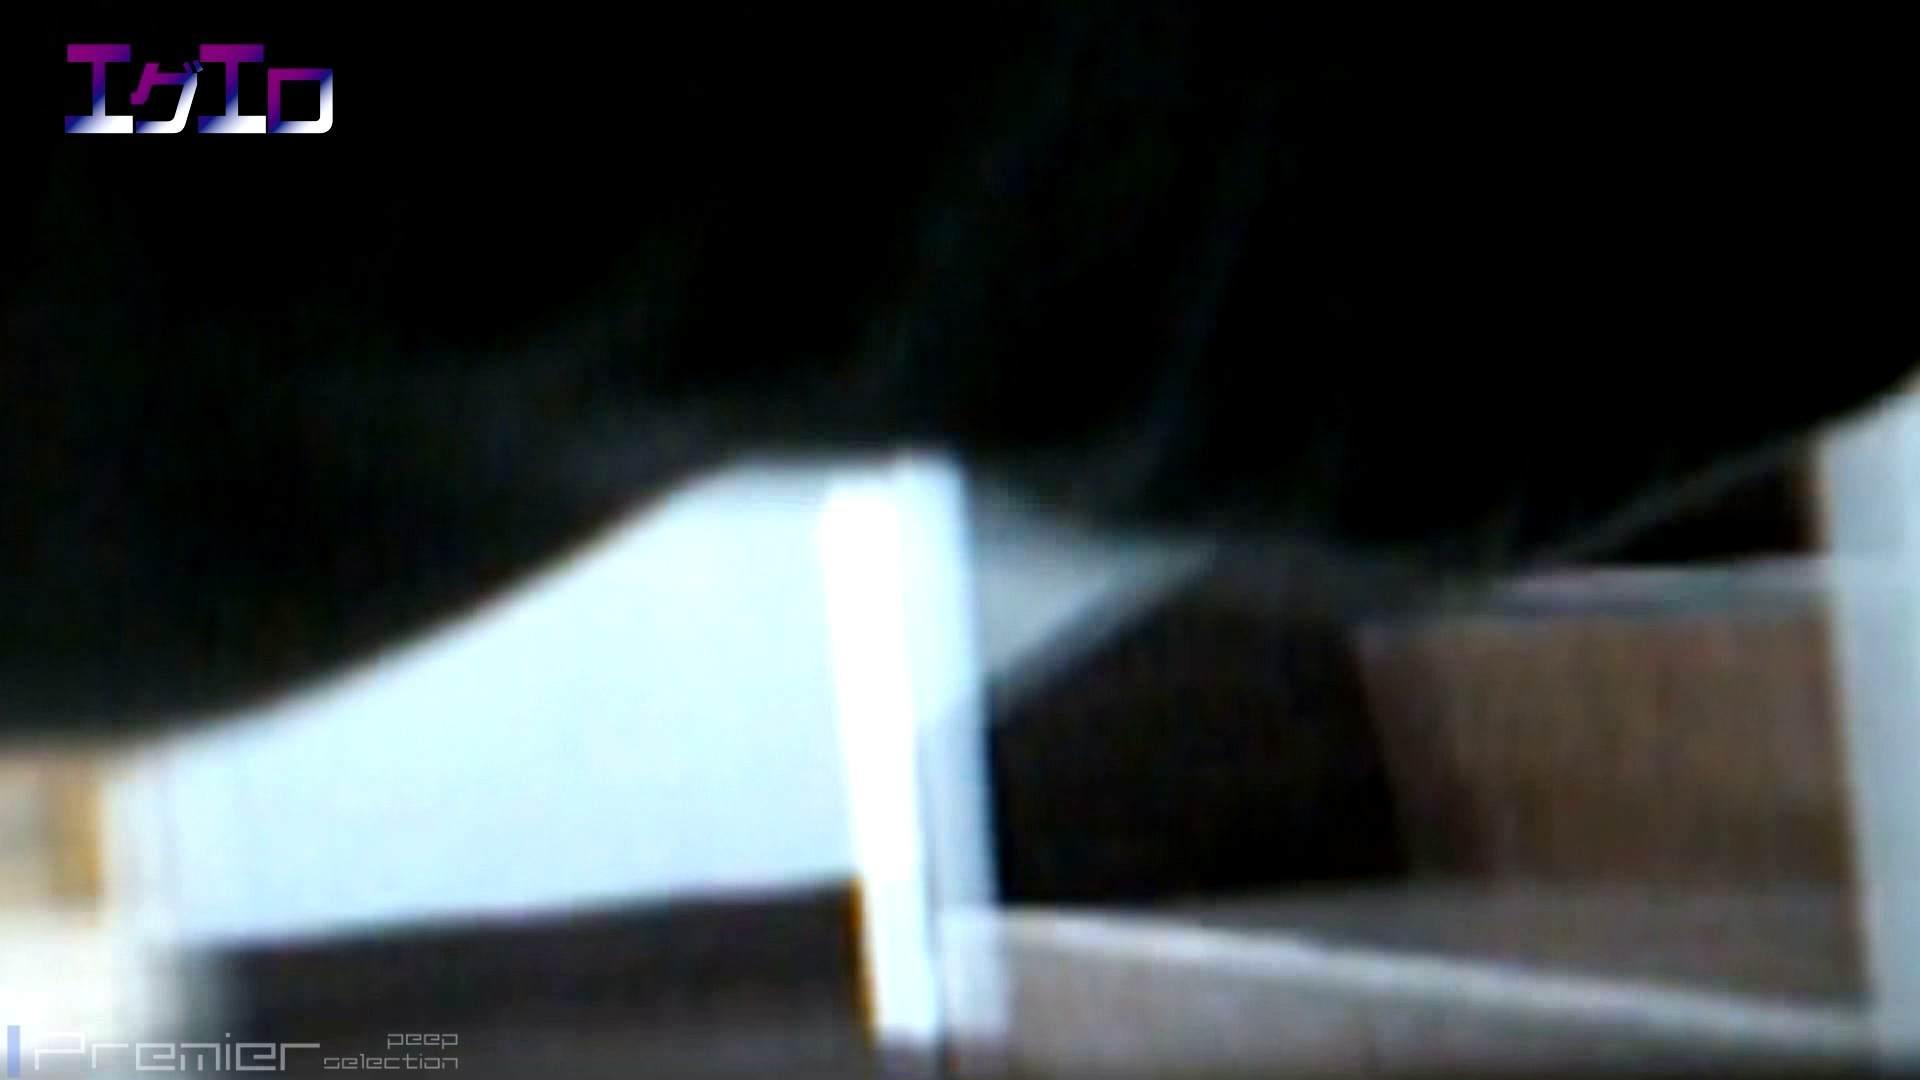 至近距離洗面所 Vol.08 細身・スレンダー 性交動画流出 48画像 46